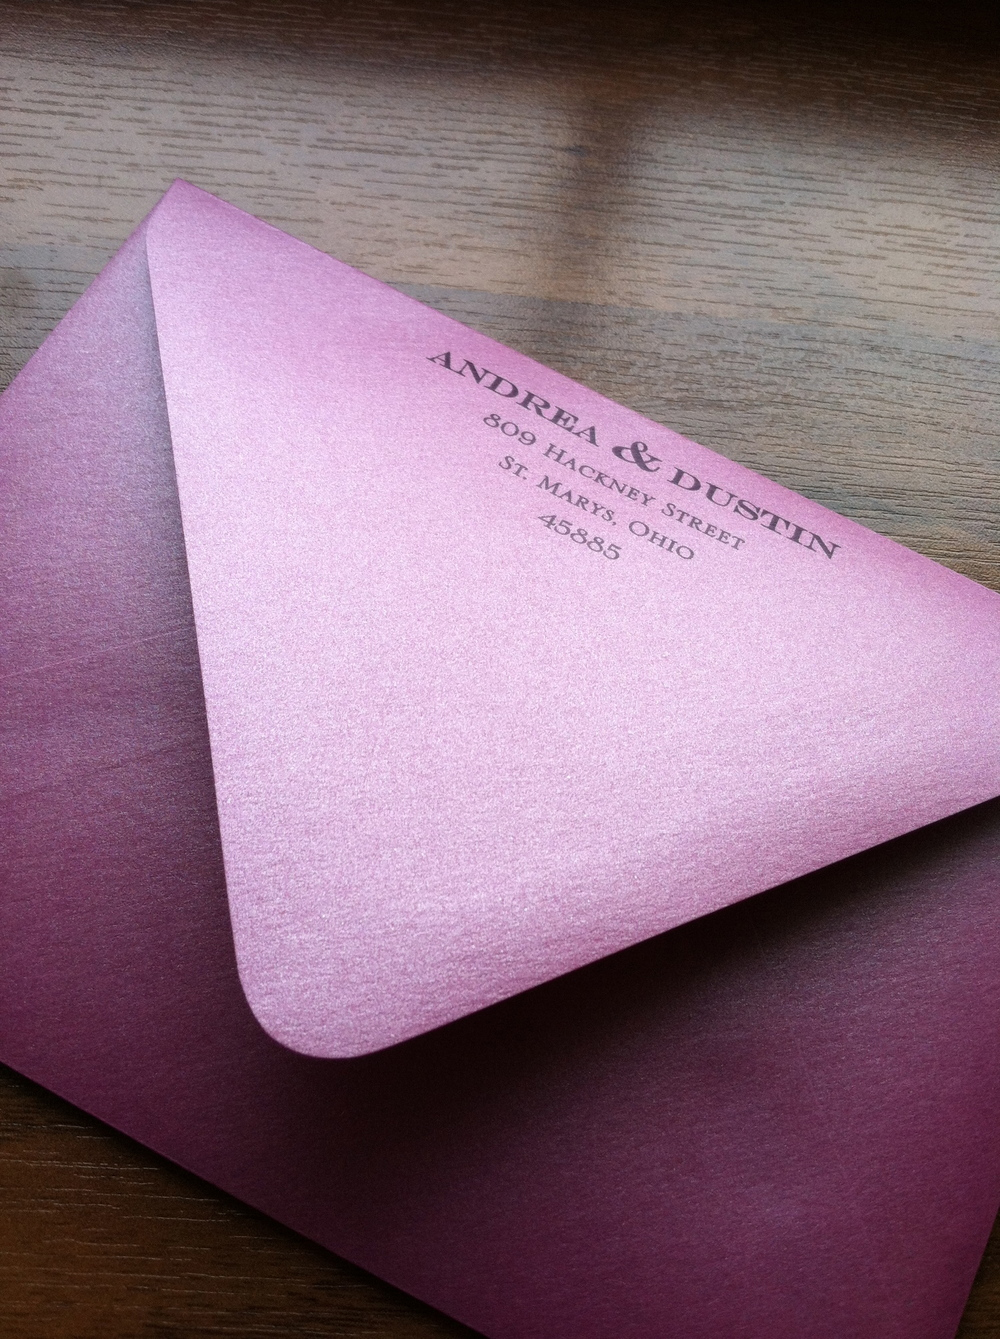 Another fun envelope.